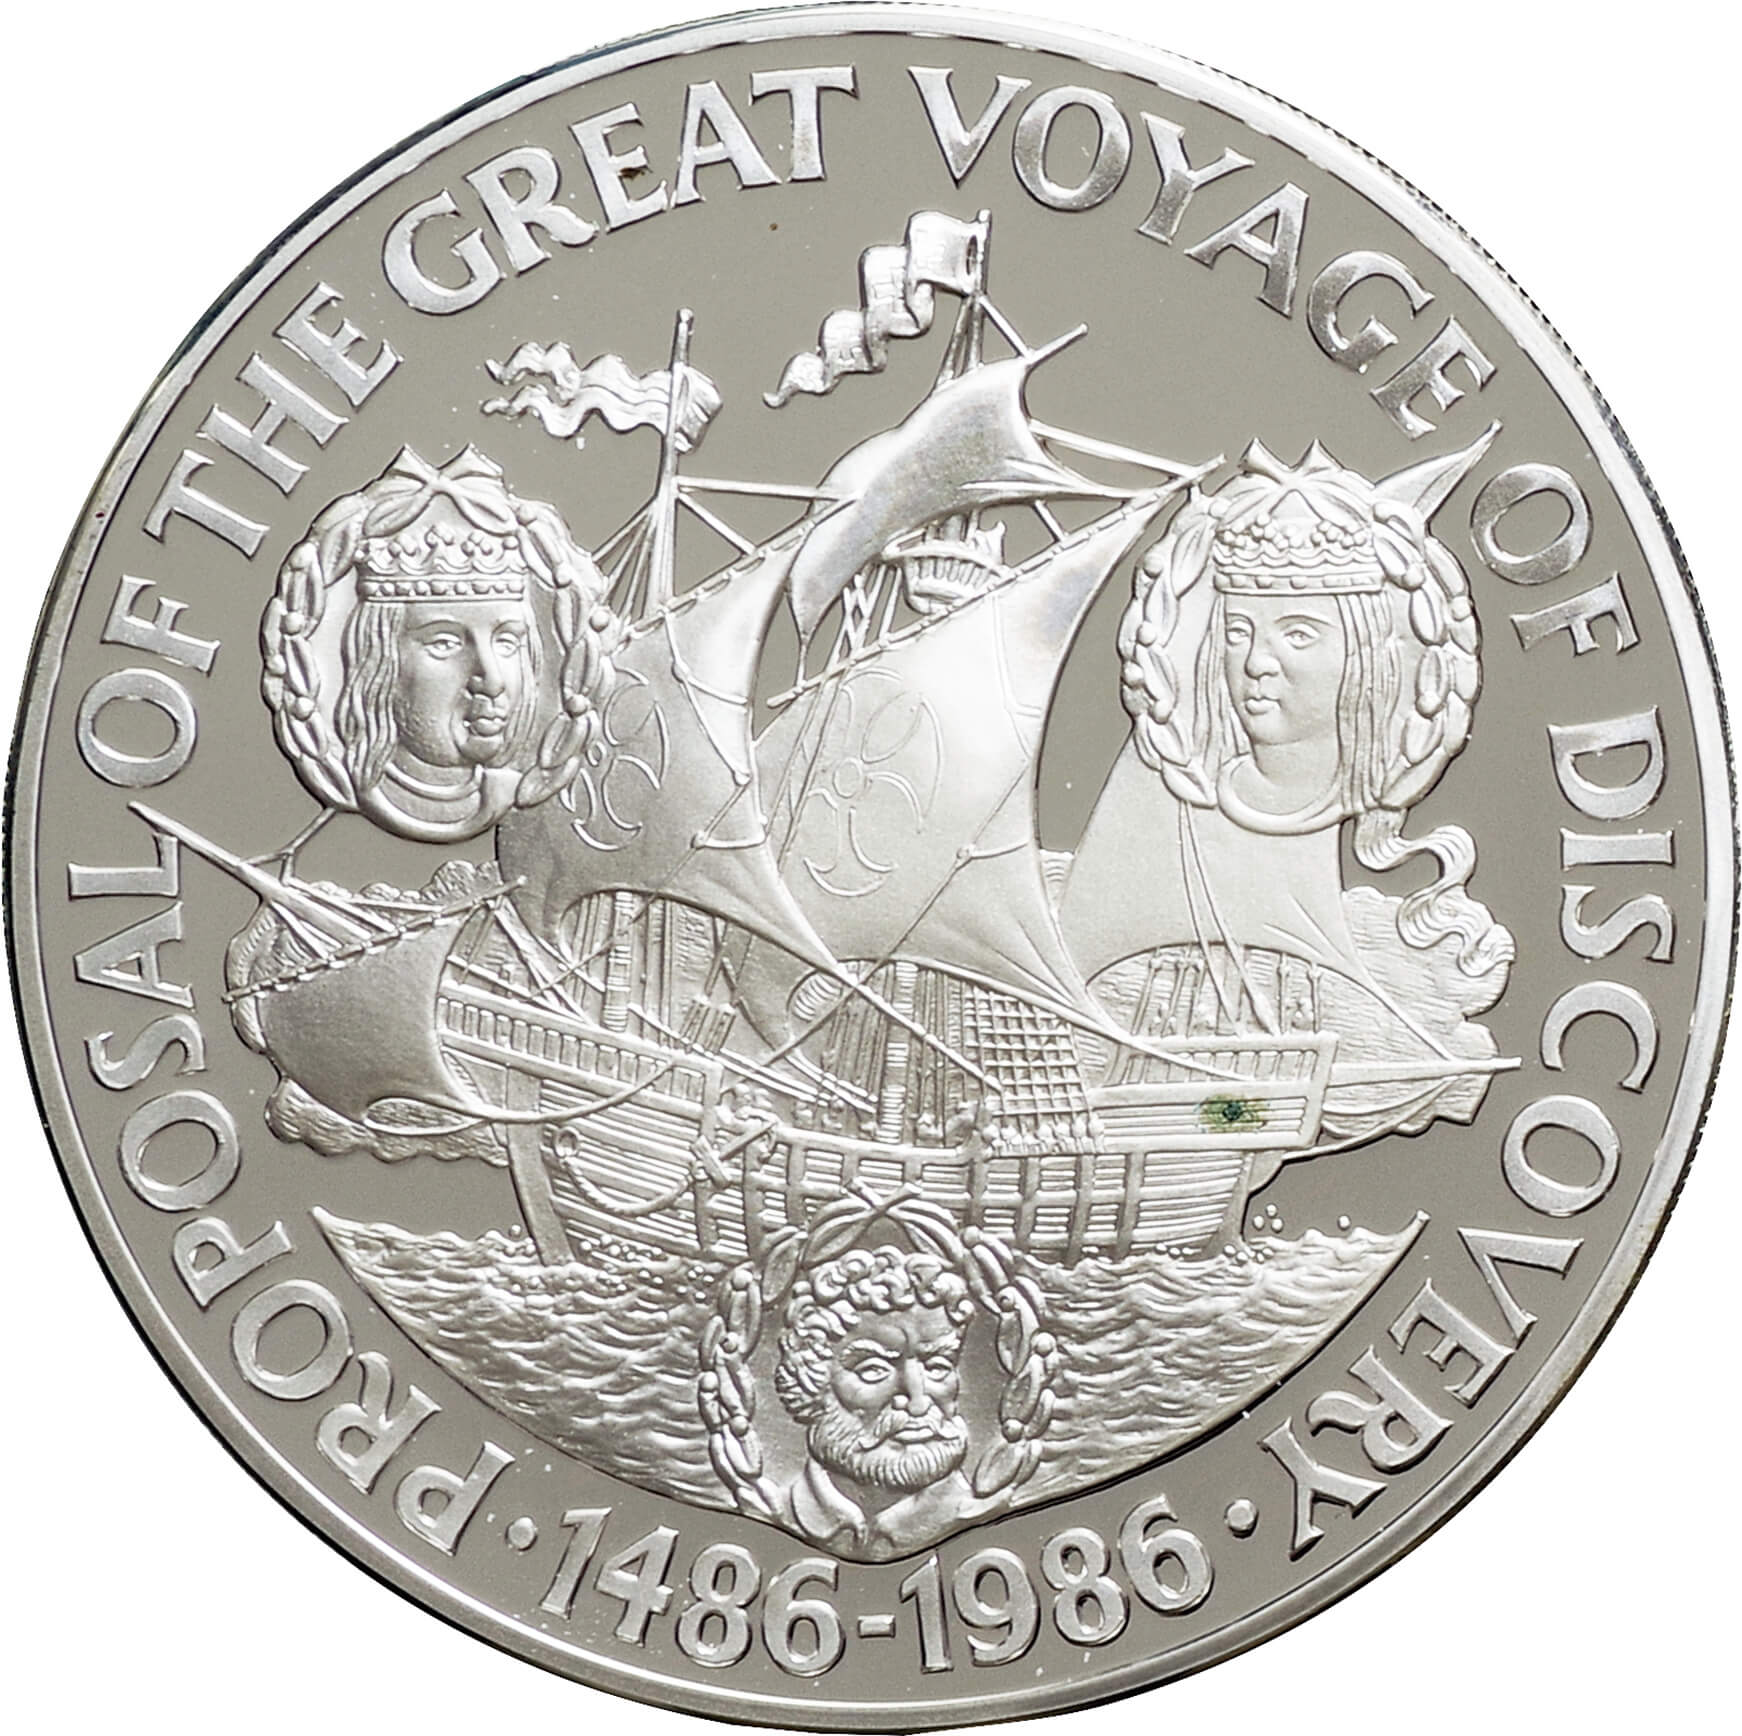 Foreign Coin Very Fine Lot Of 3 1988 El Salvador 1 Colon Christopher Columbus